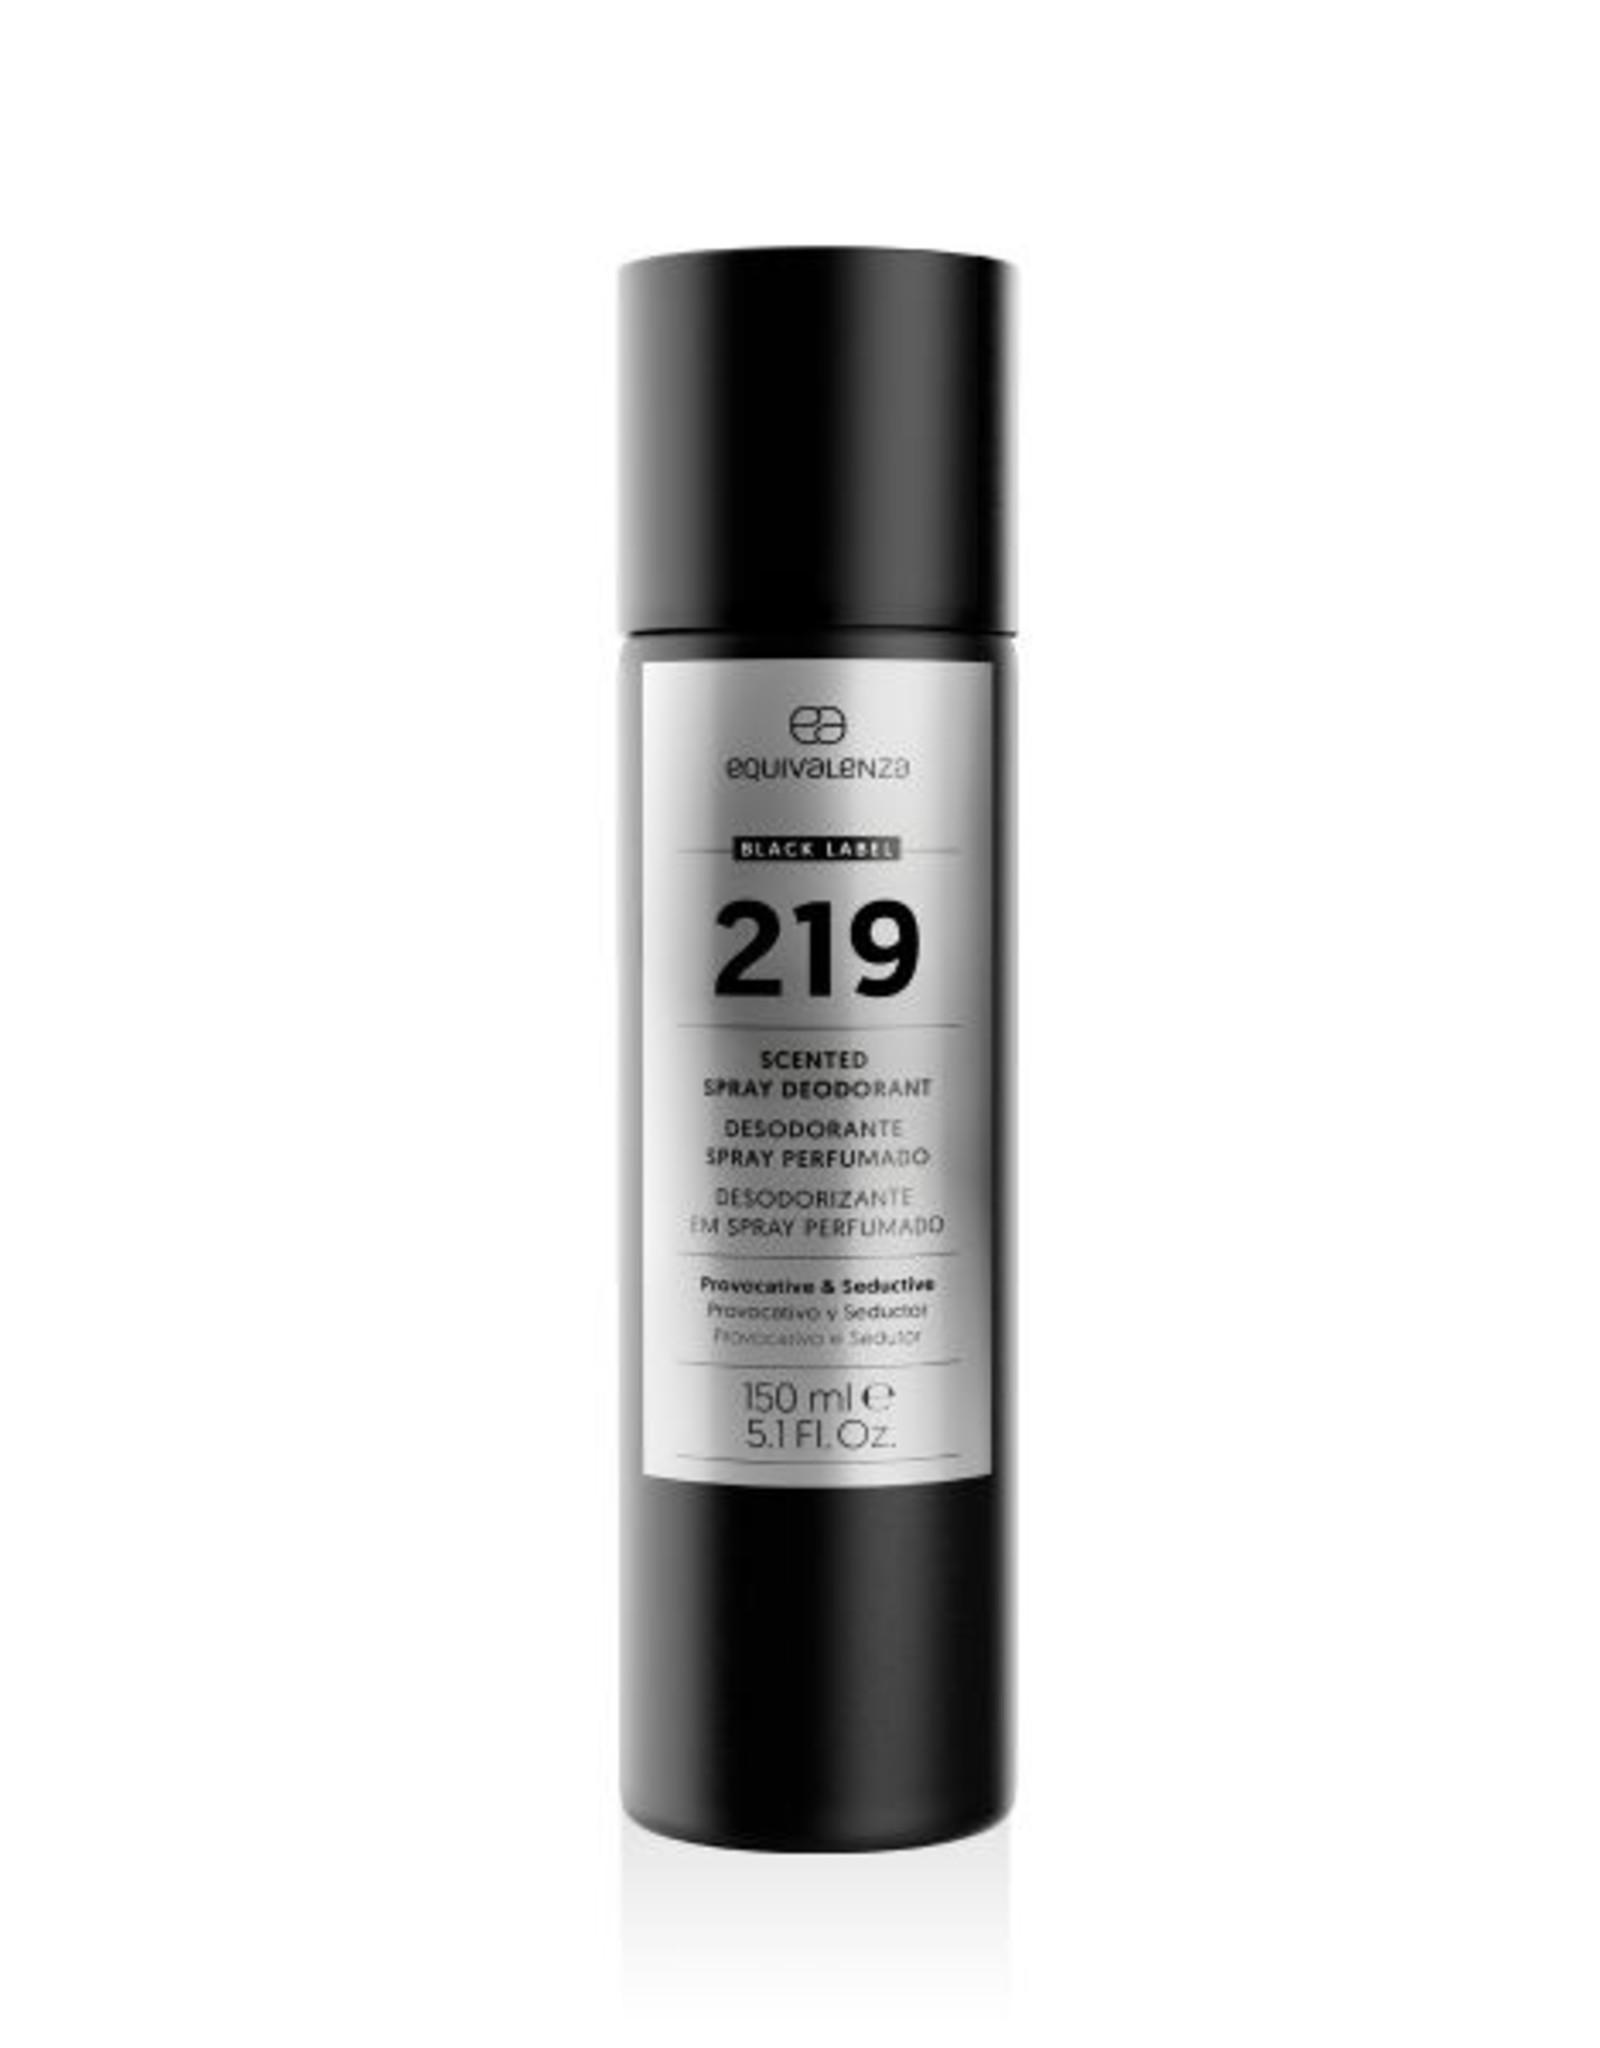 Equivalenza Black Label Deodorant 219